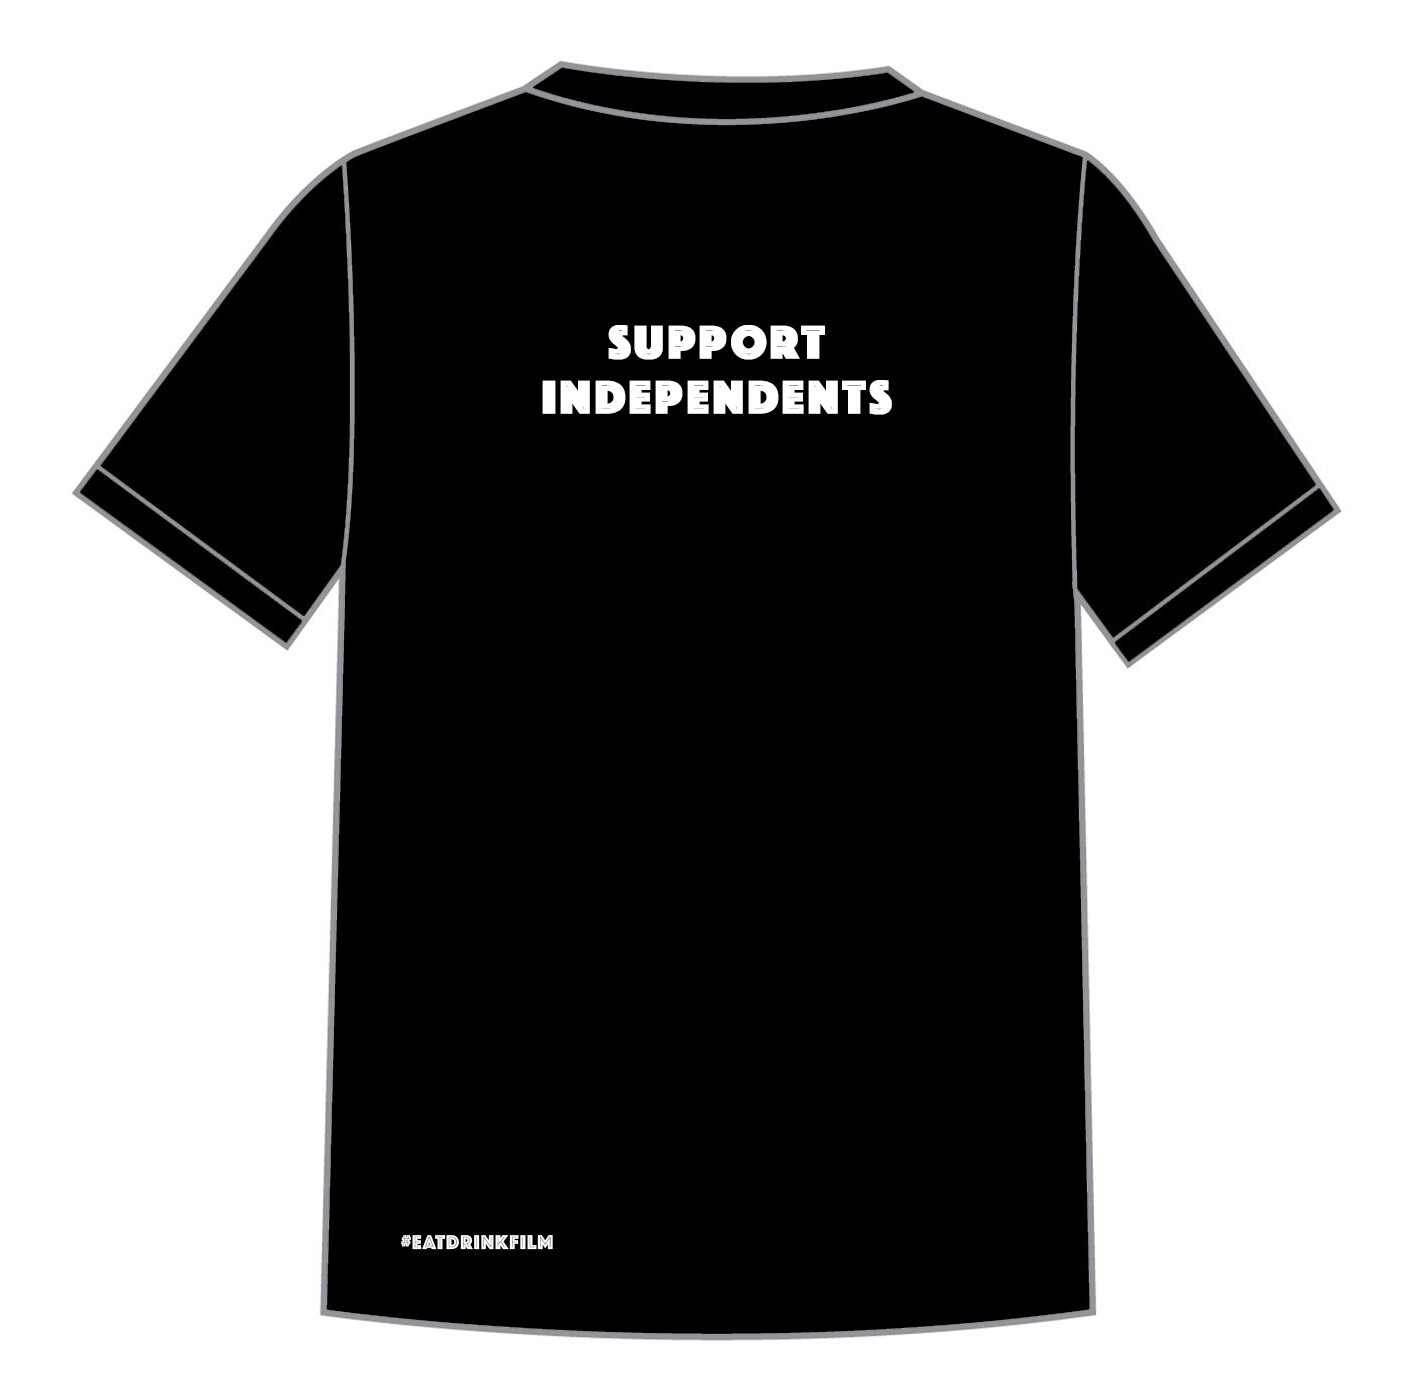 MB Independent T-shirt (Black)